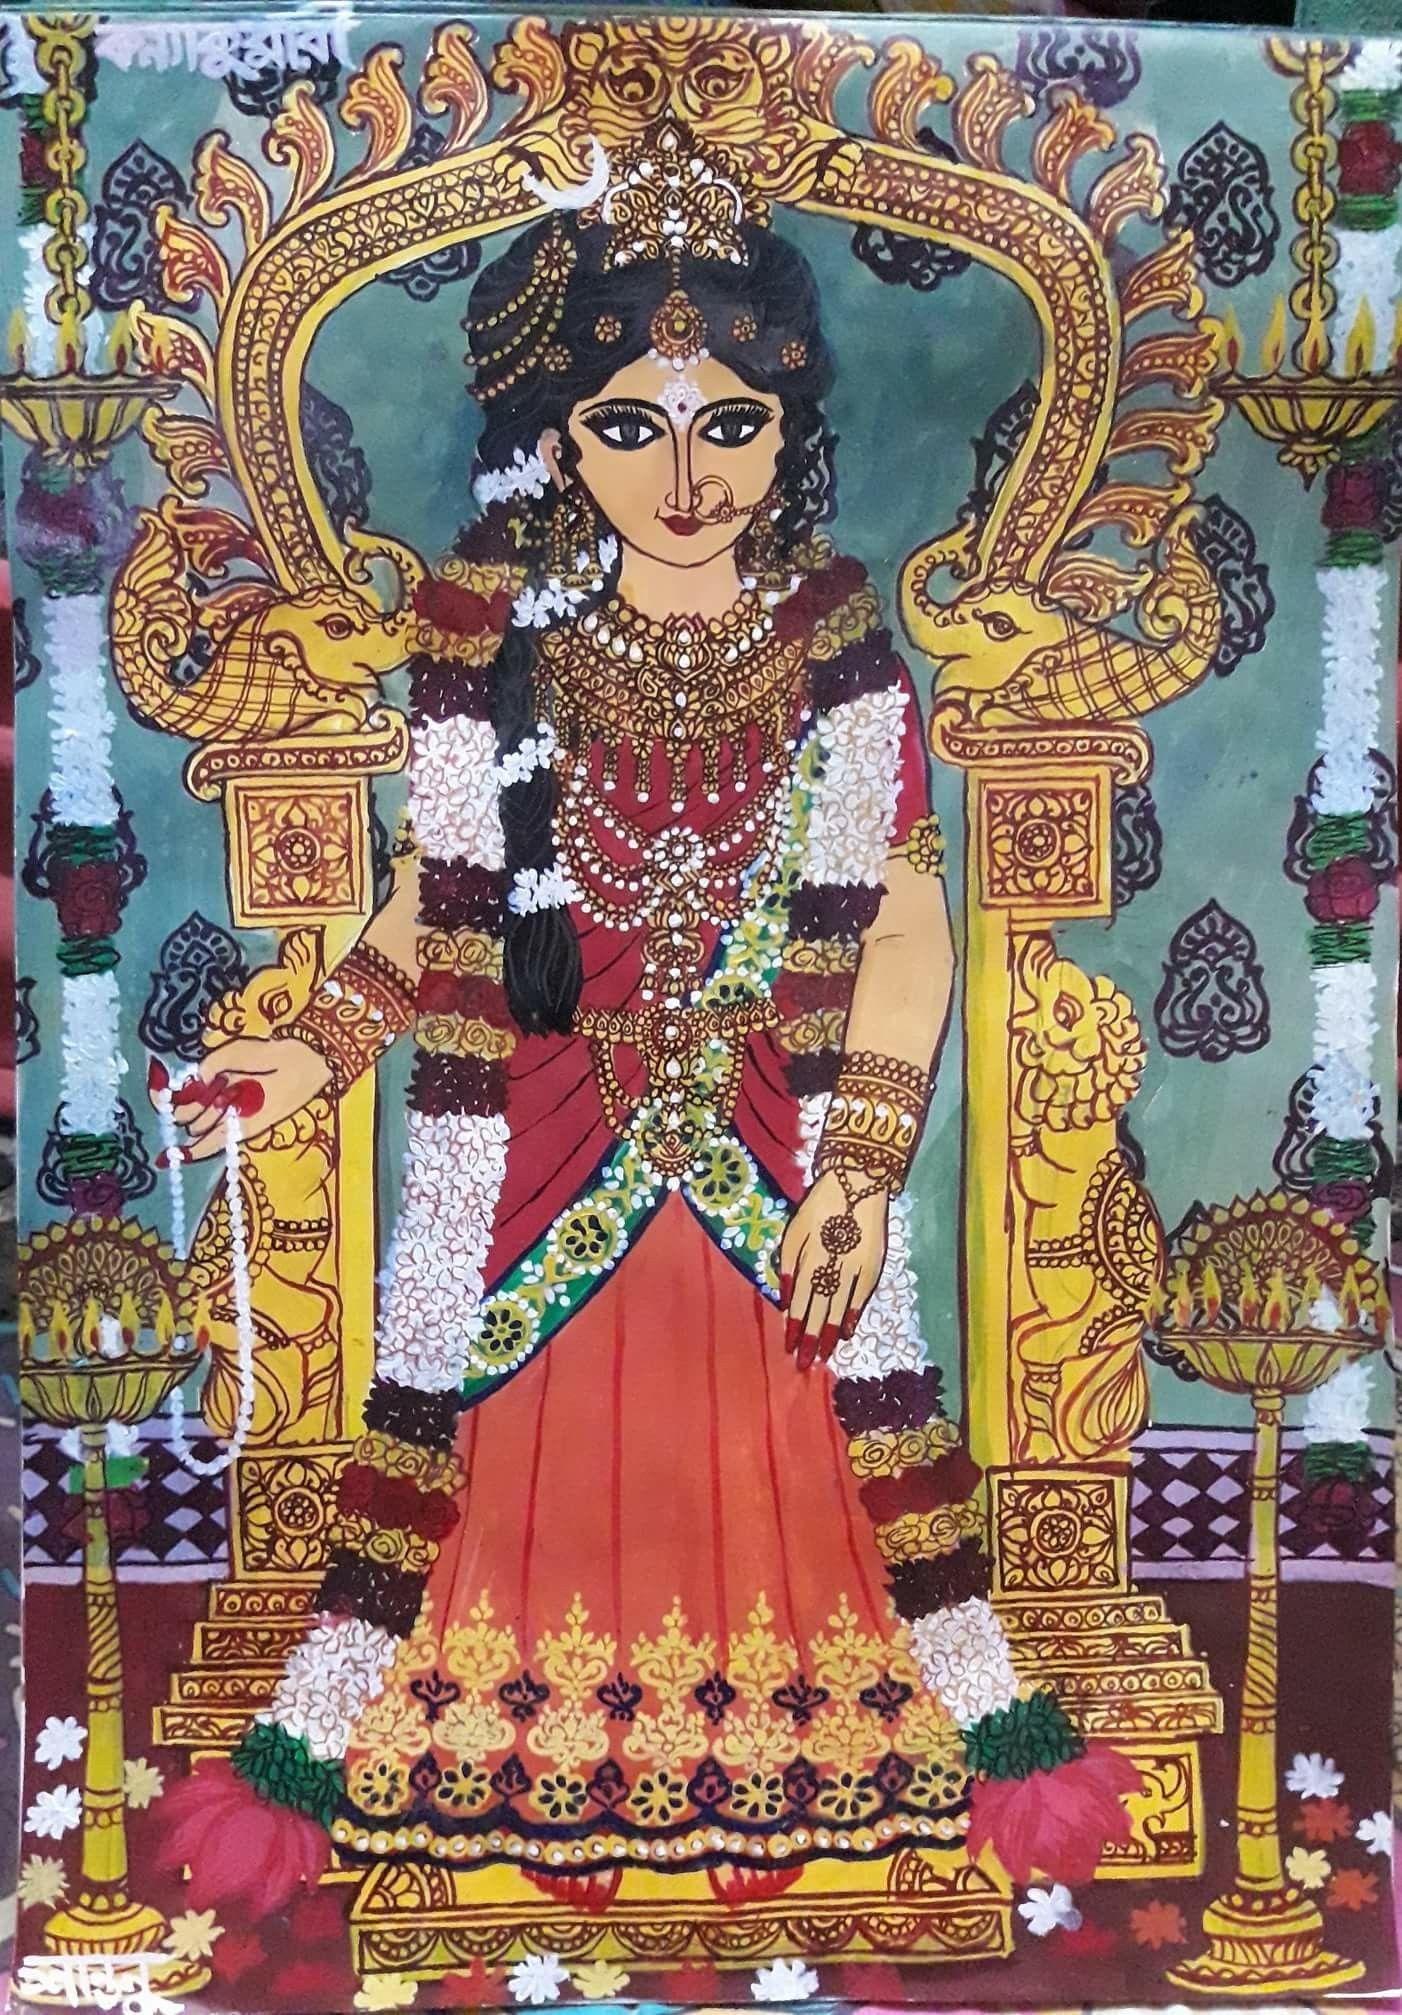 Devi Kanyakumari Art By Santanu Das Adhikari From His